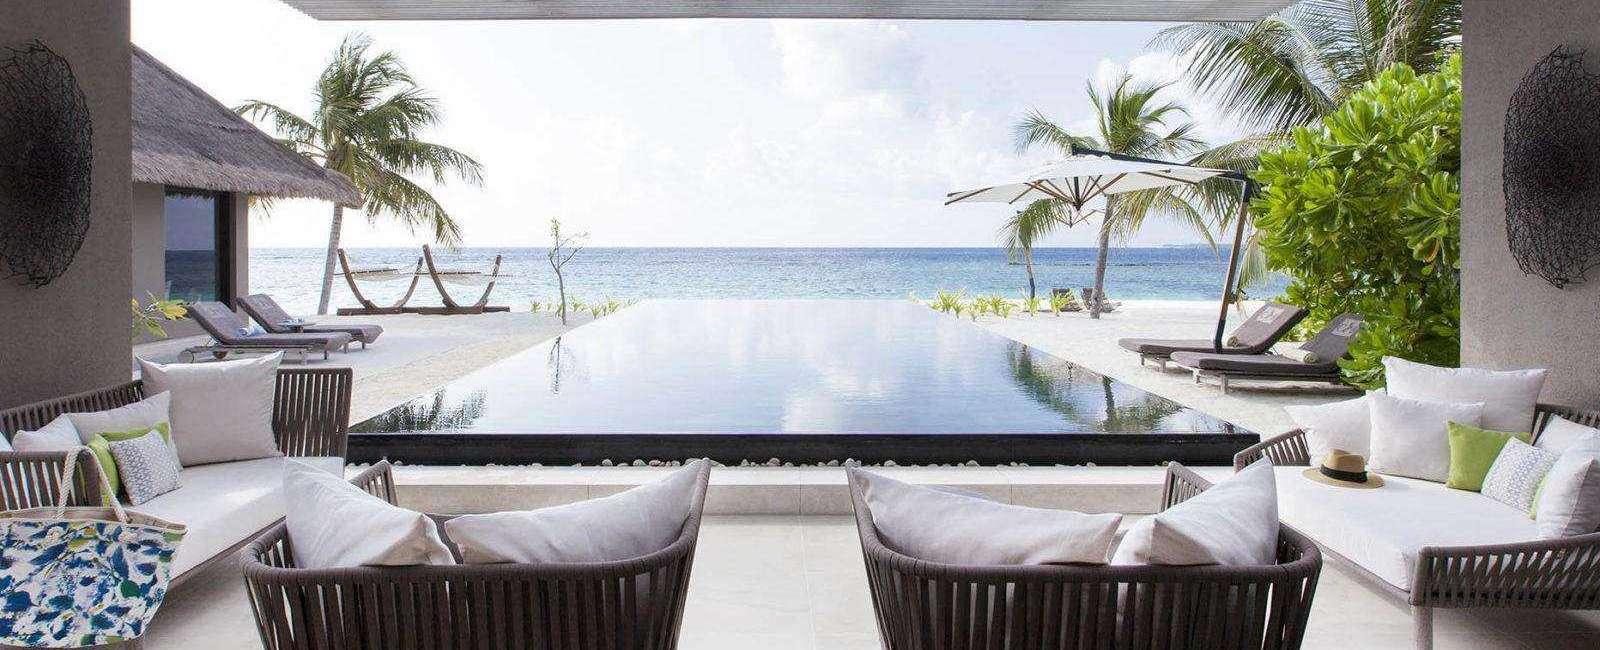 Island Villa One Bedroom Cheval Blanc Randheli Maldives